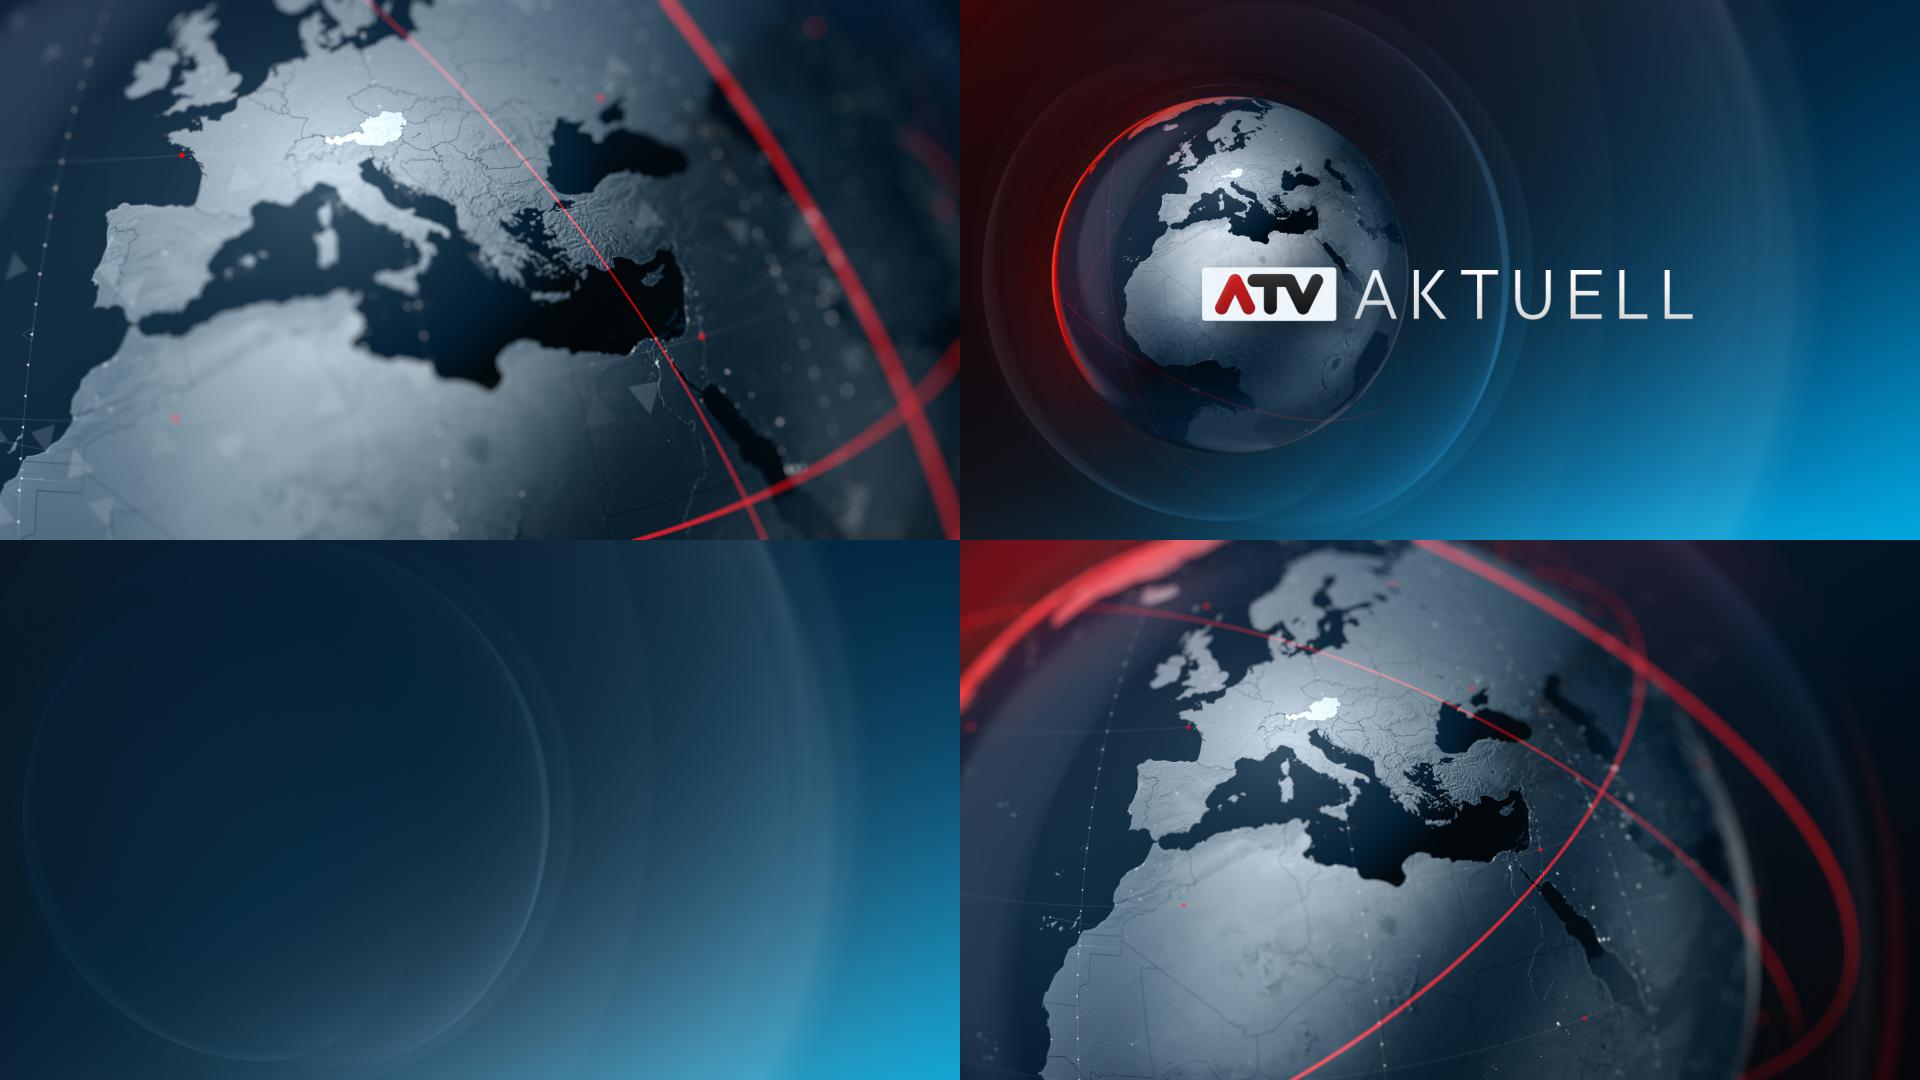 ATV_A_ALL